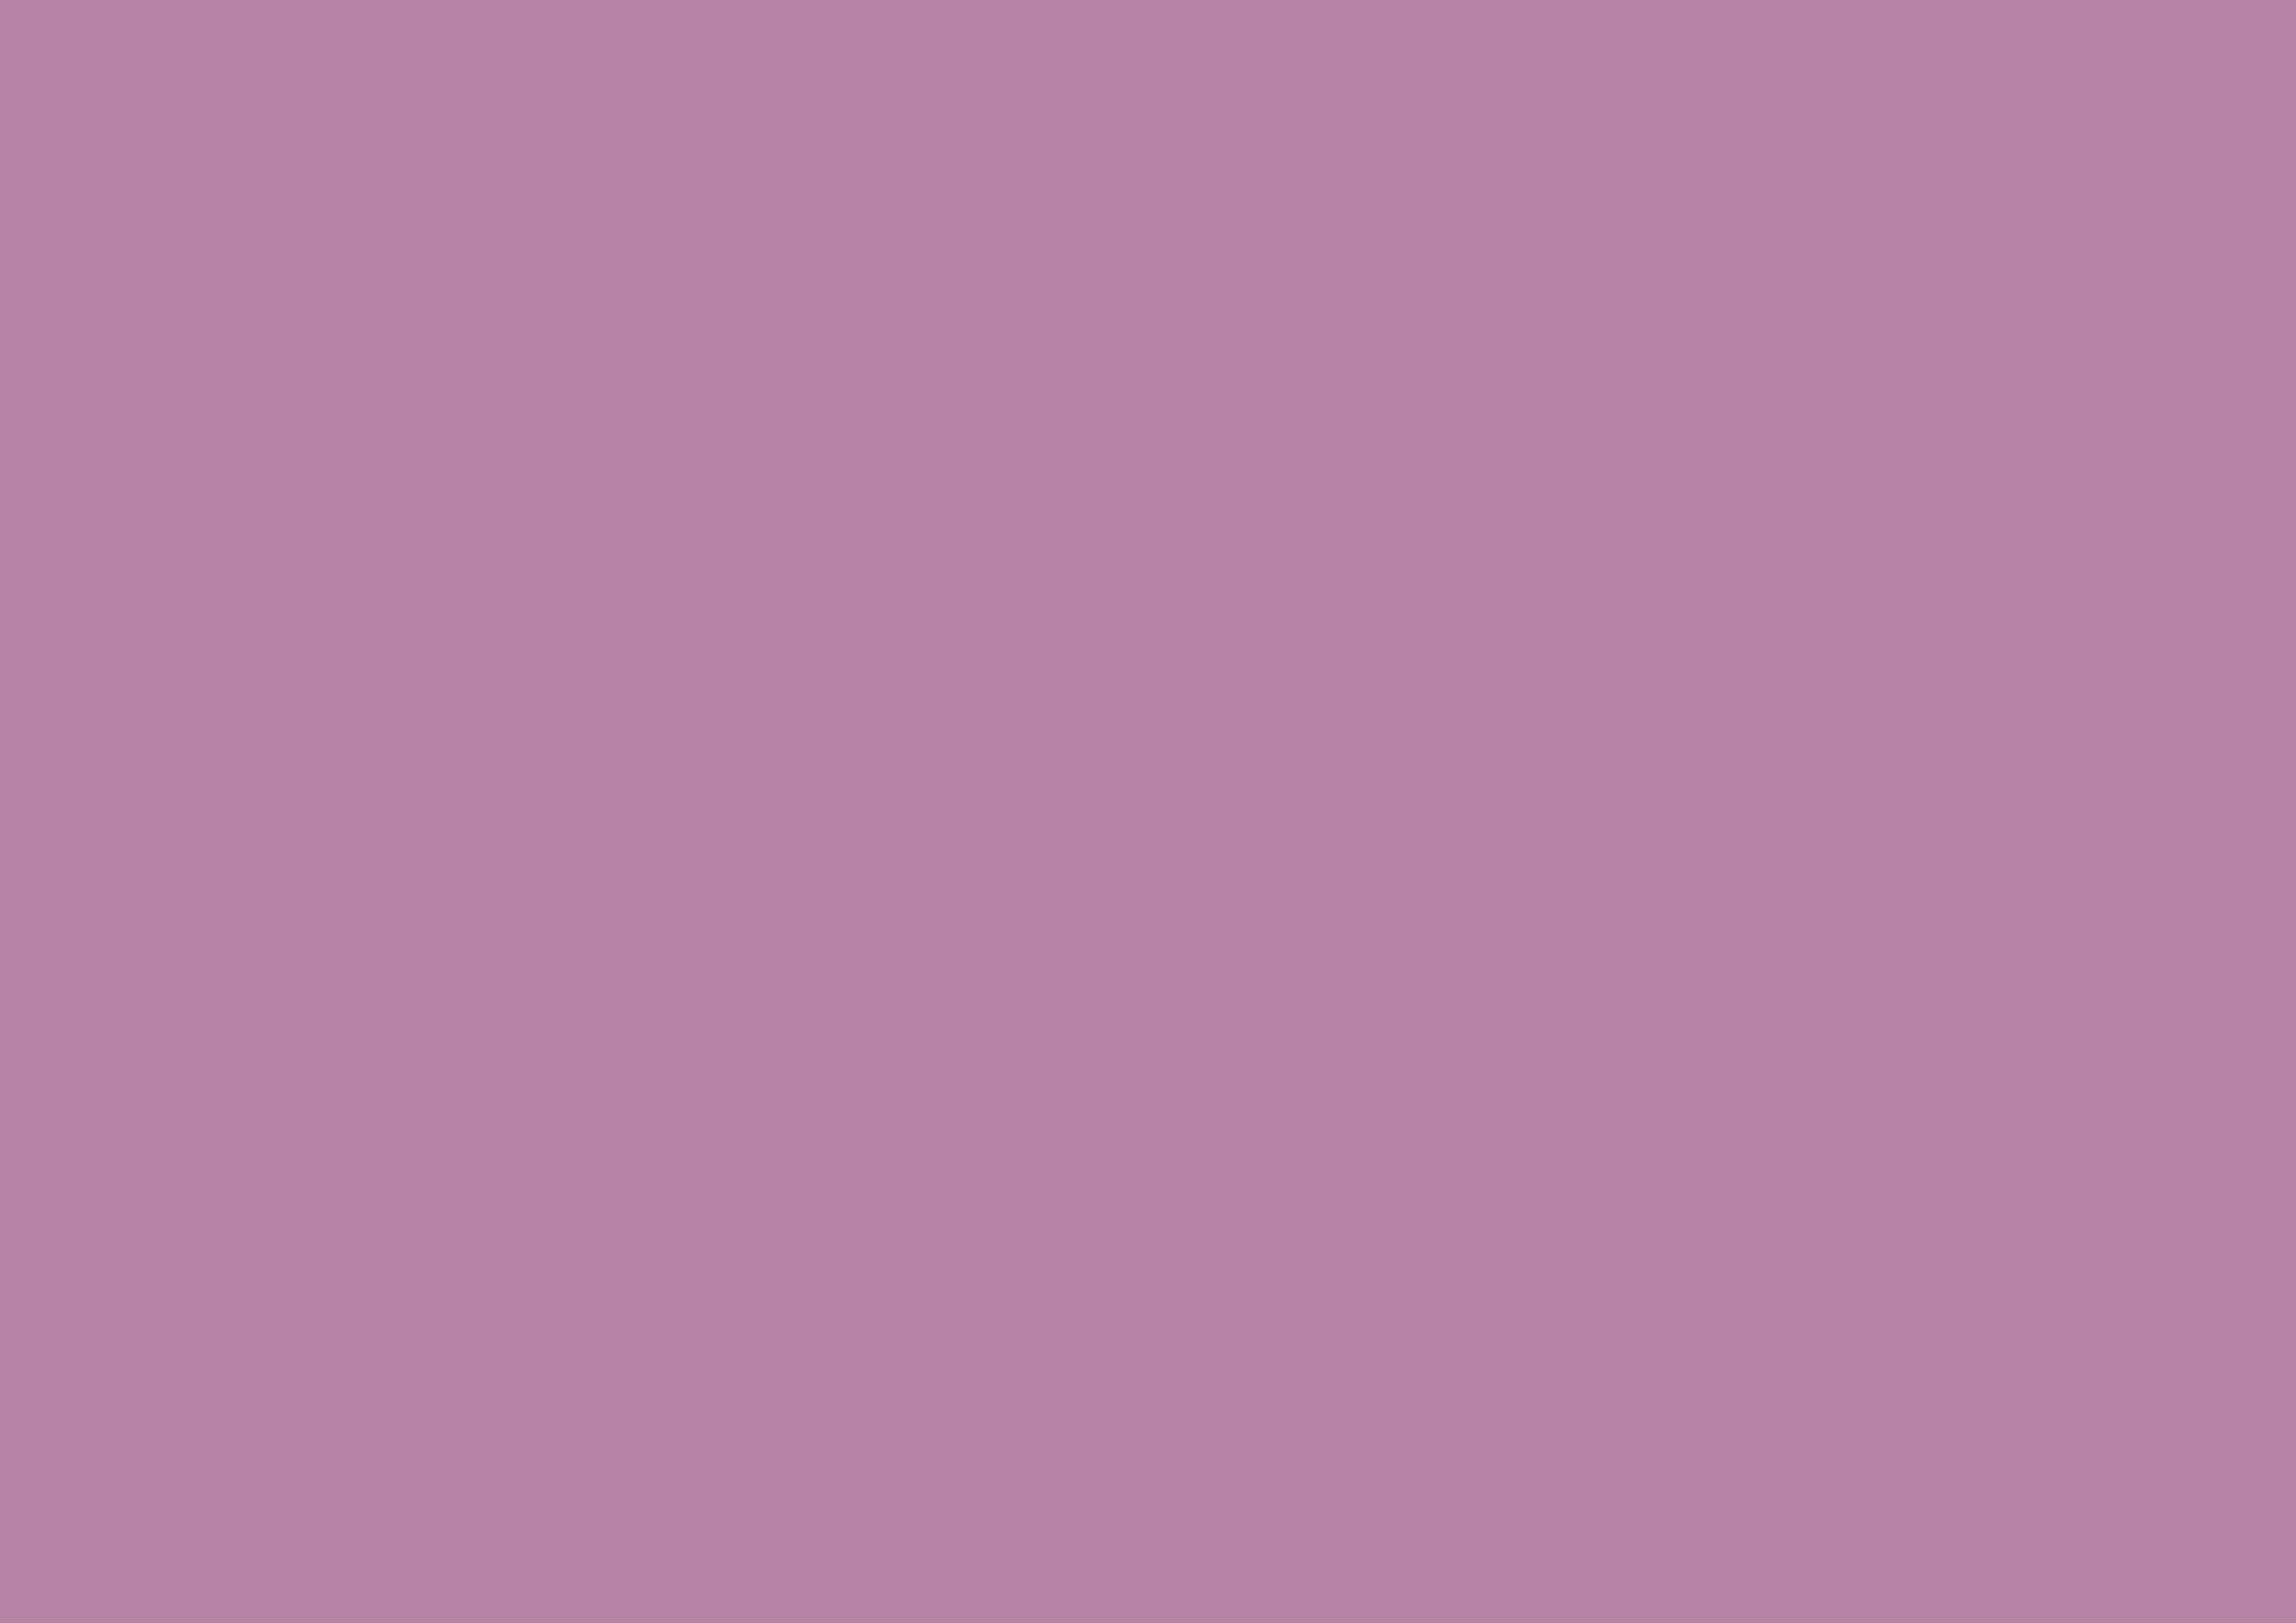 3508x2480 Opera Mauve Solid Color Background